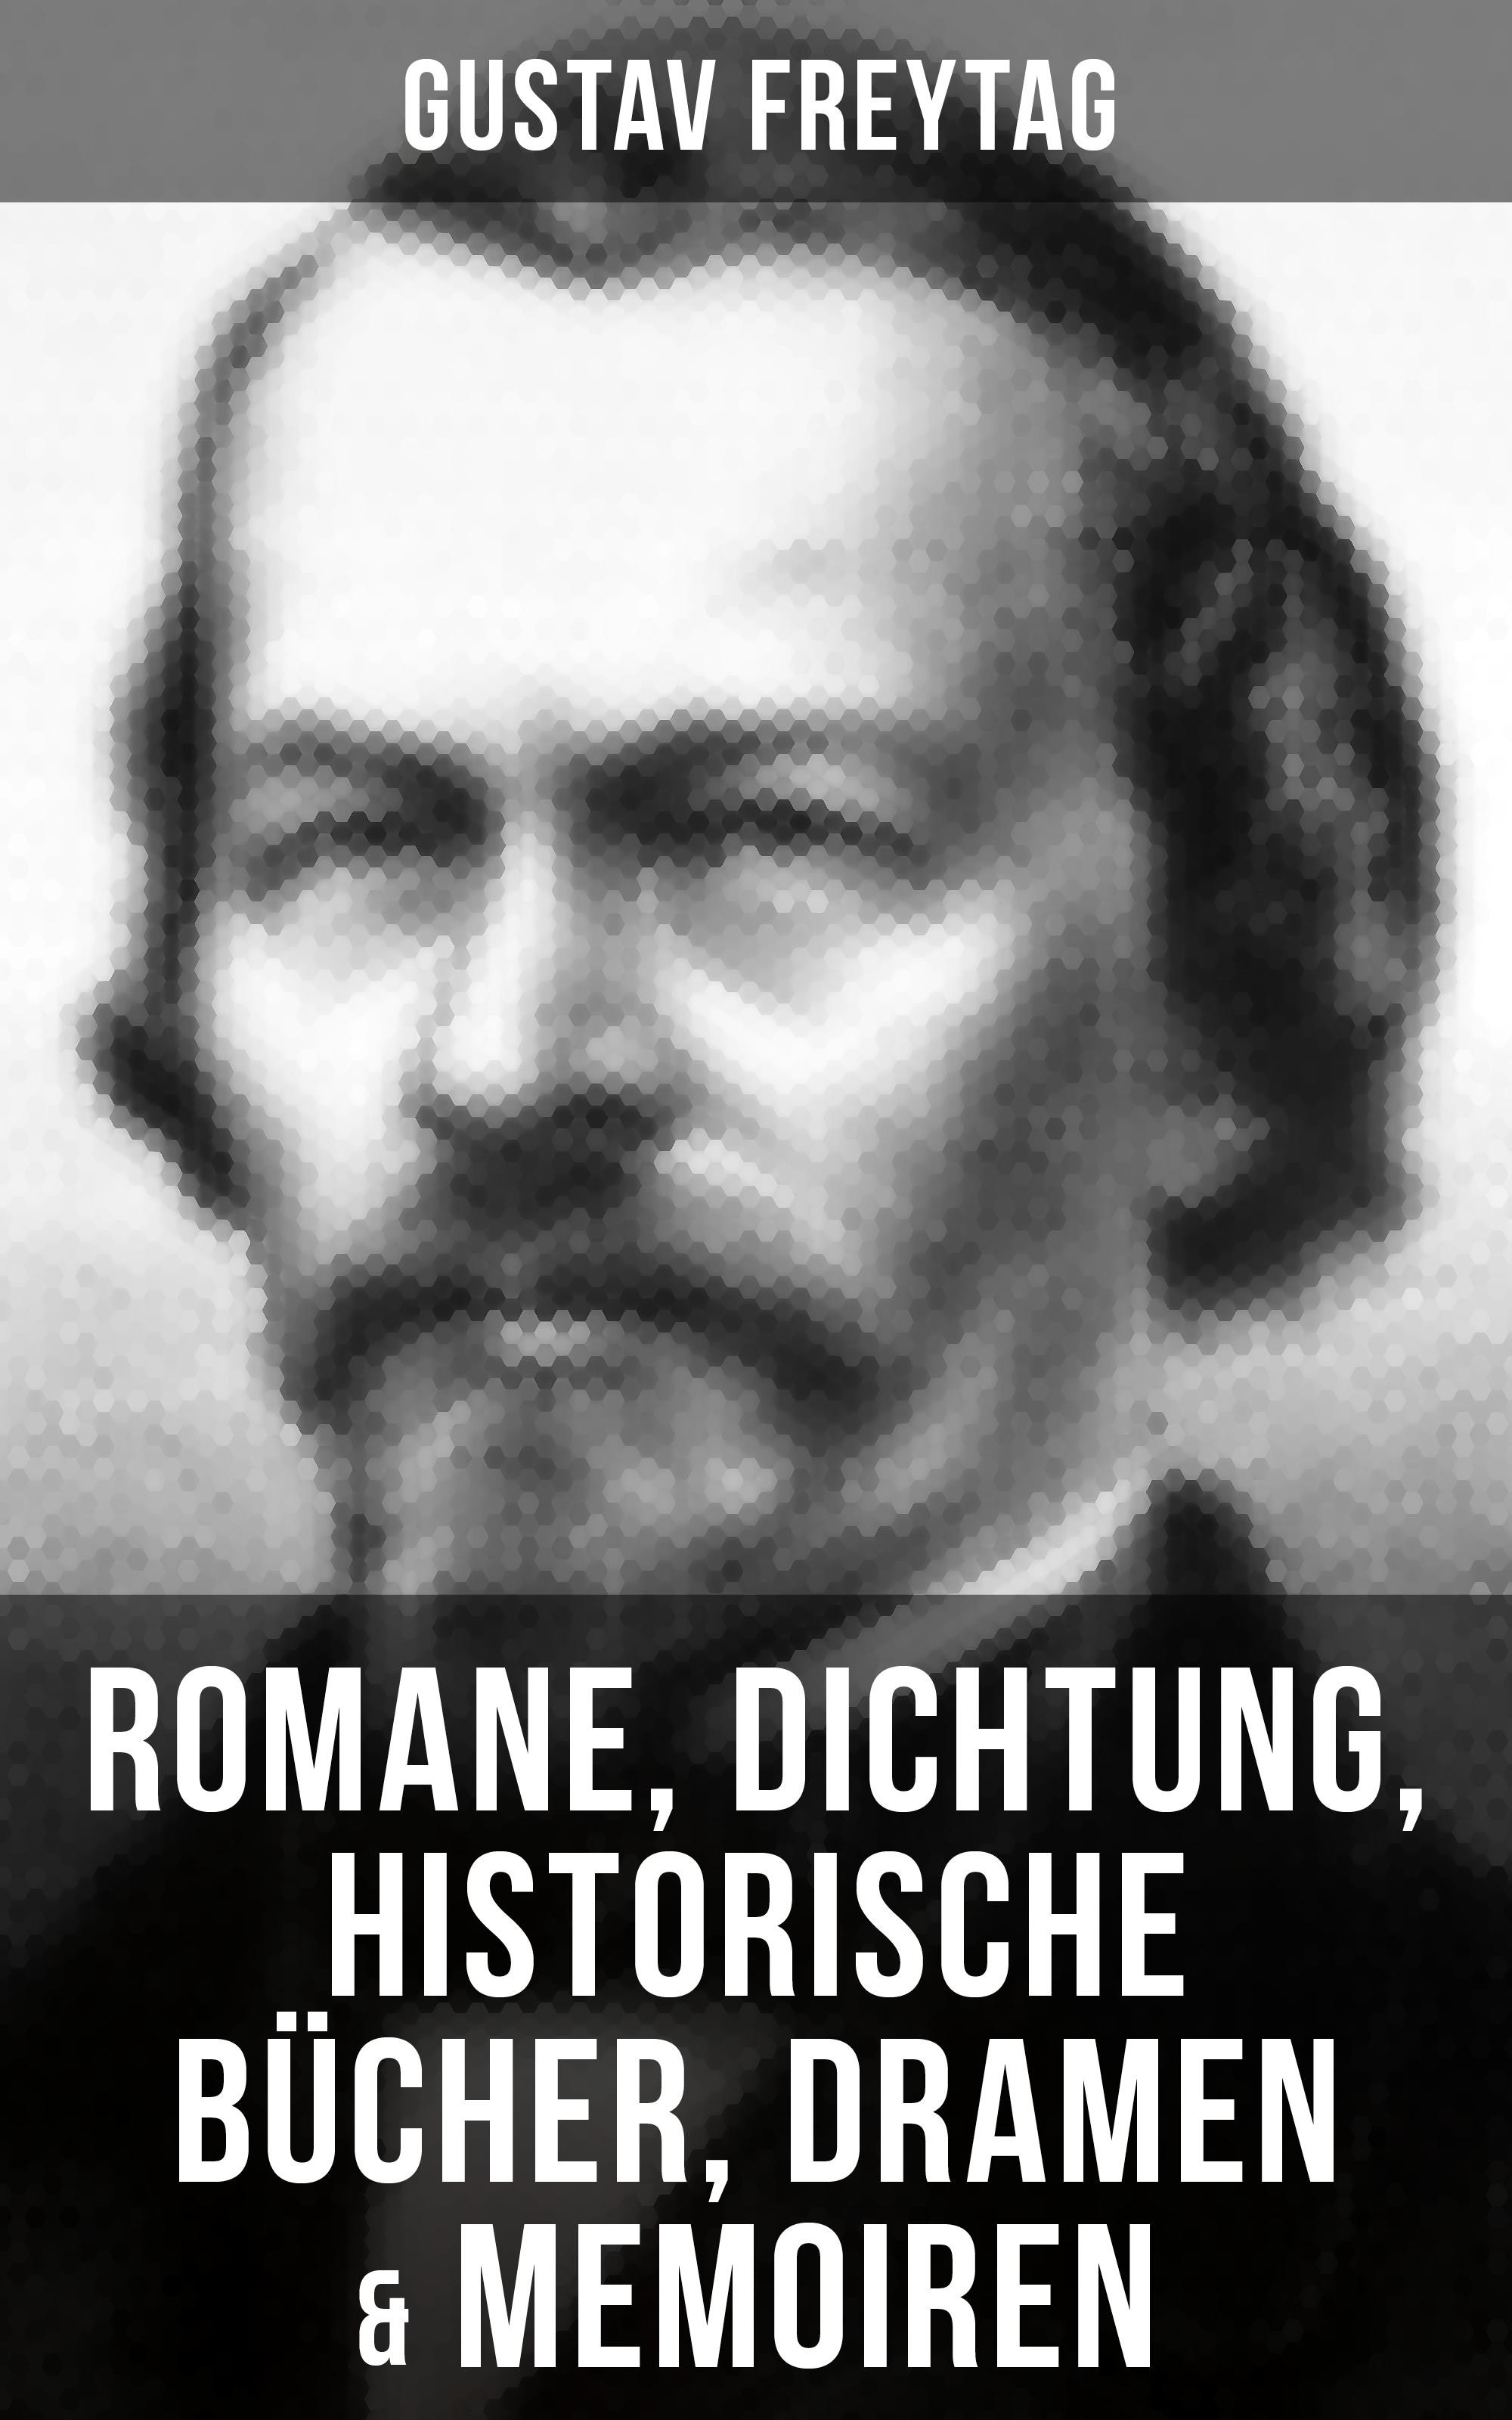 Фото - Gustav Freytag Gustav Freytag: Romane, Dichtung, Historische Bücher, Dramen & Memoiren gustav parthey mirabilia romae e codicibvs vaticanis emendata